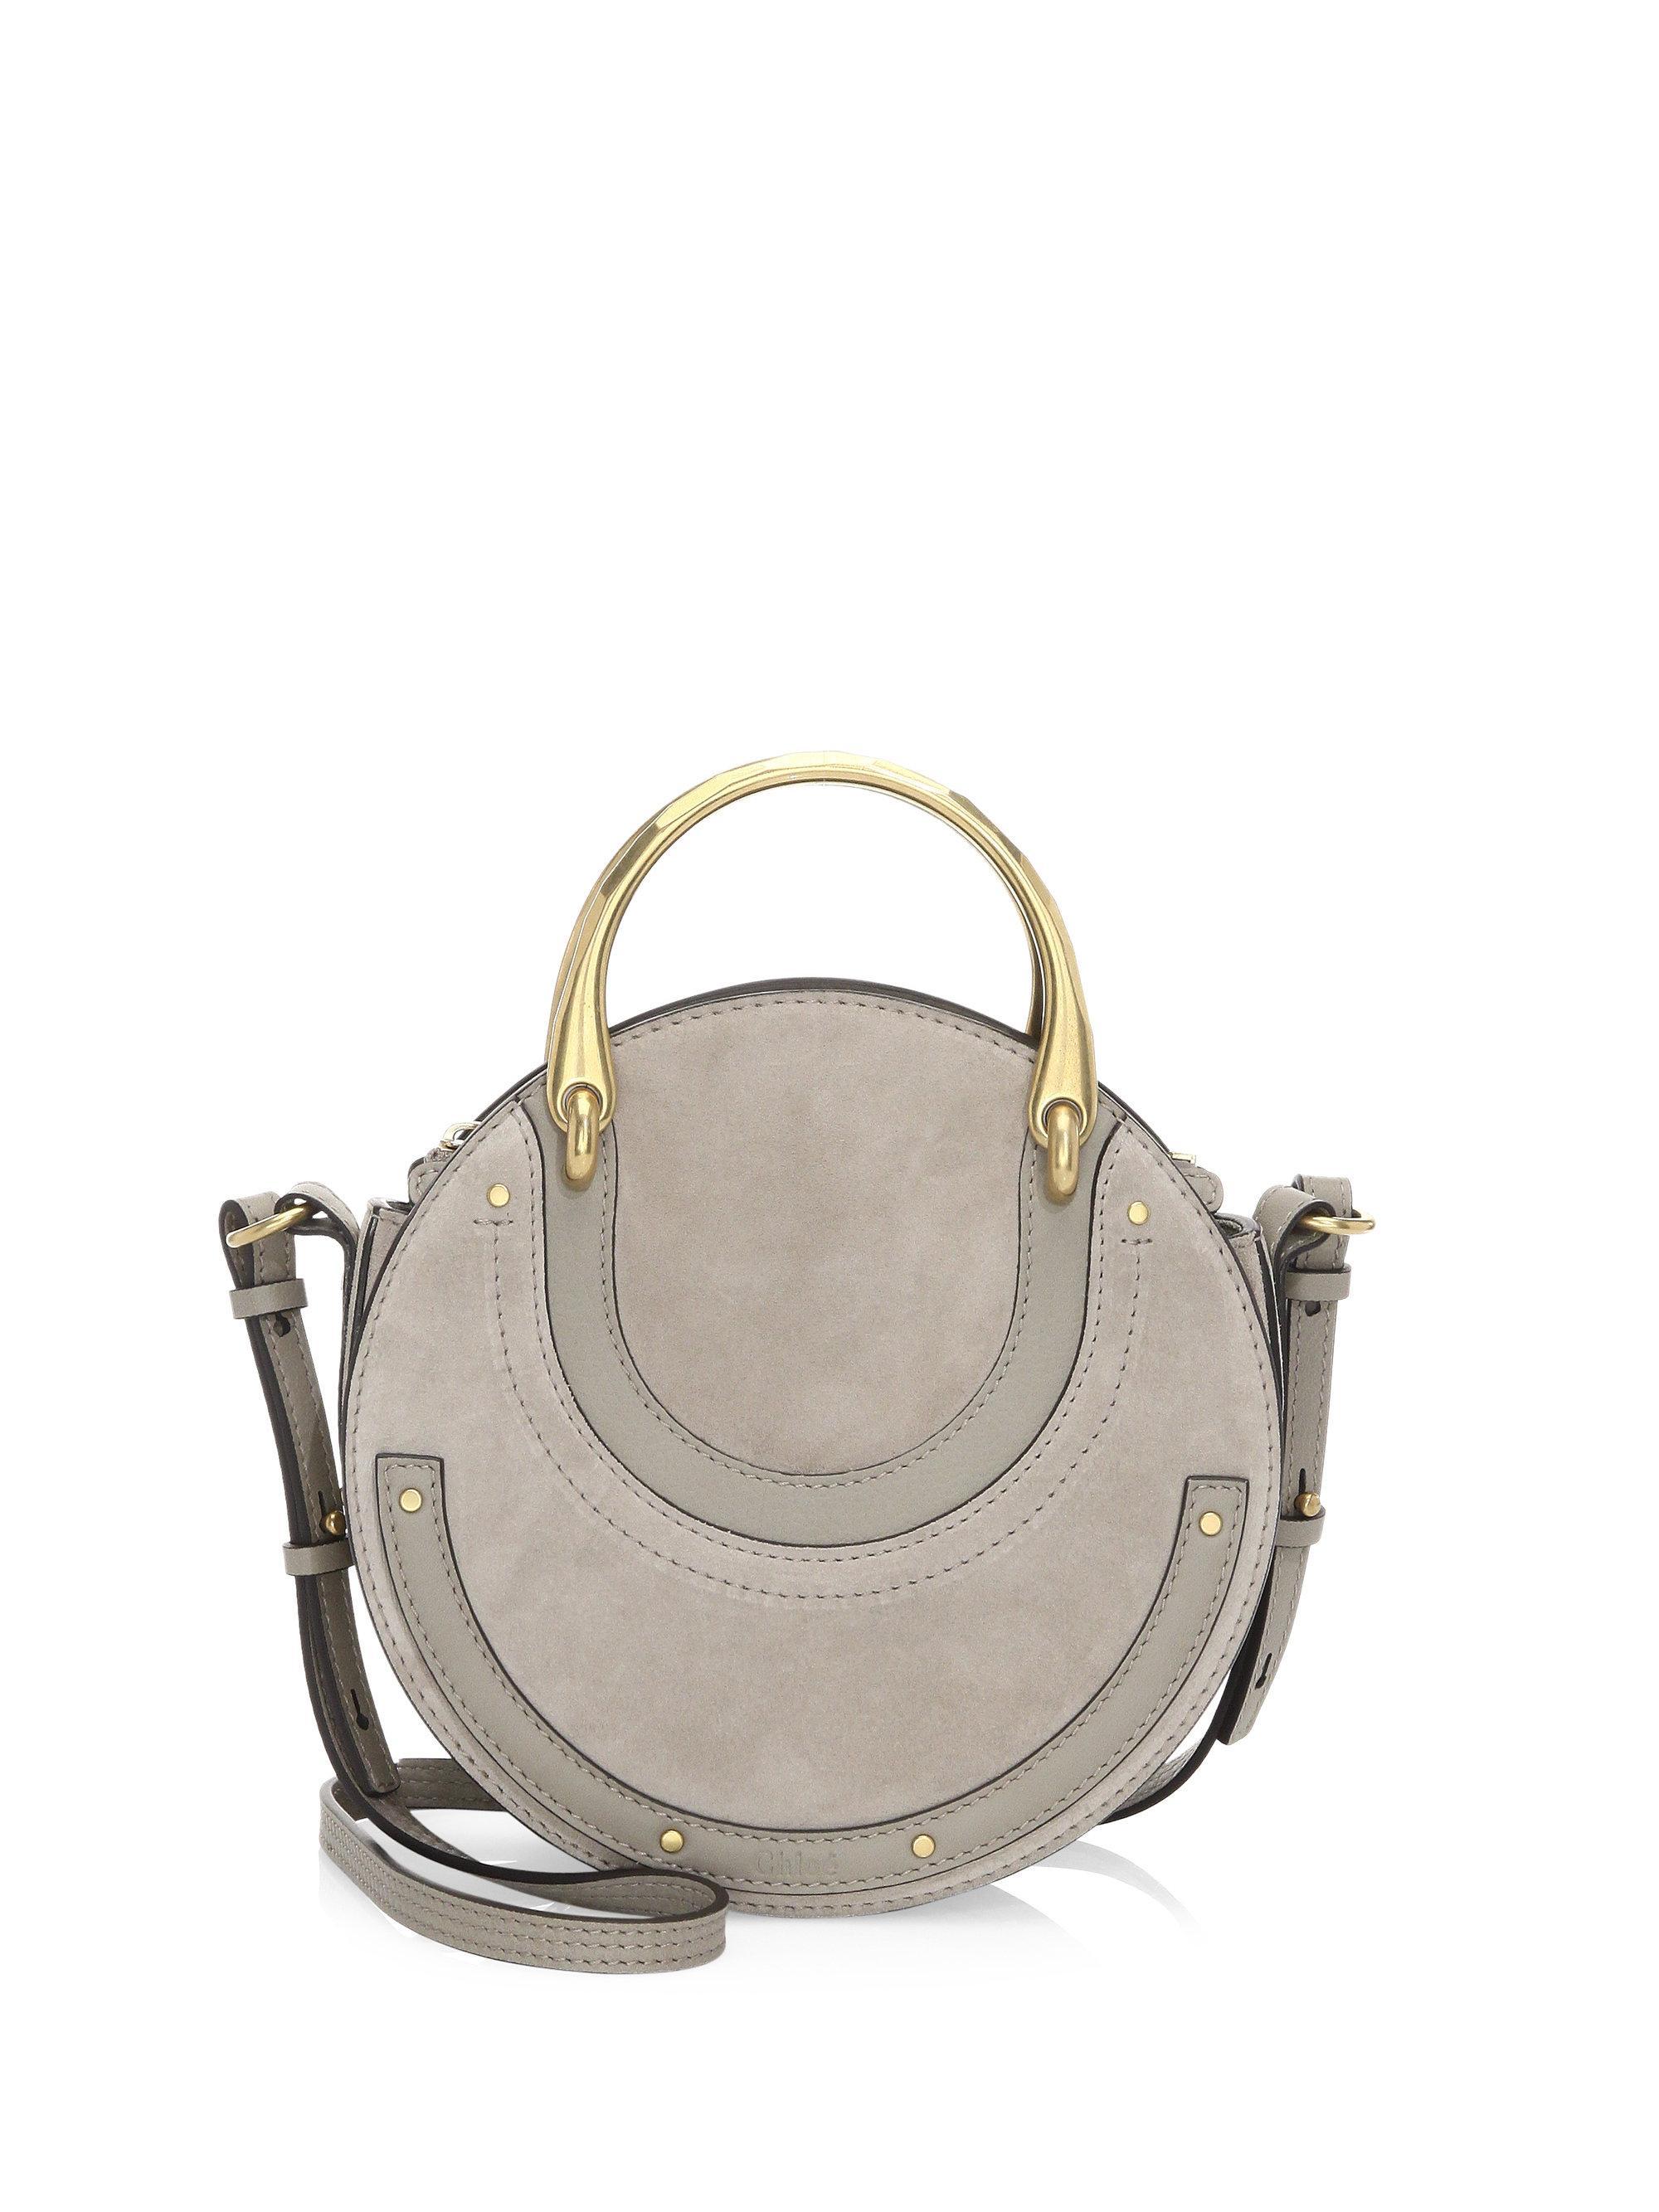 Pixi mini bag - Grey Chlo 1QM1N6